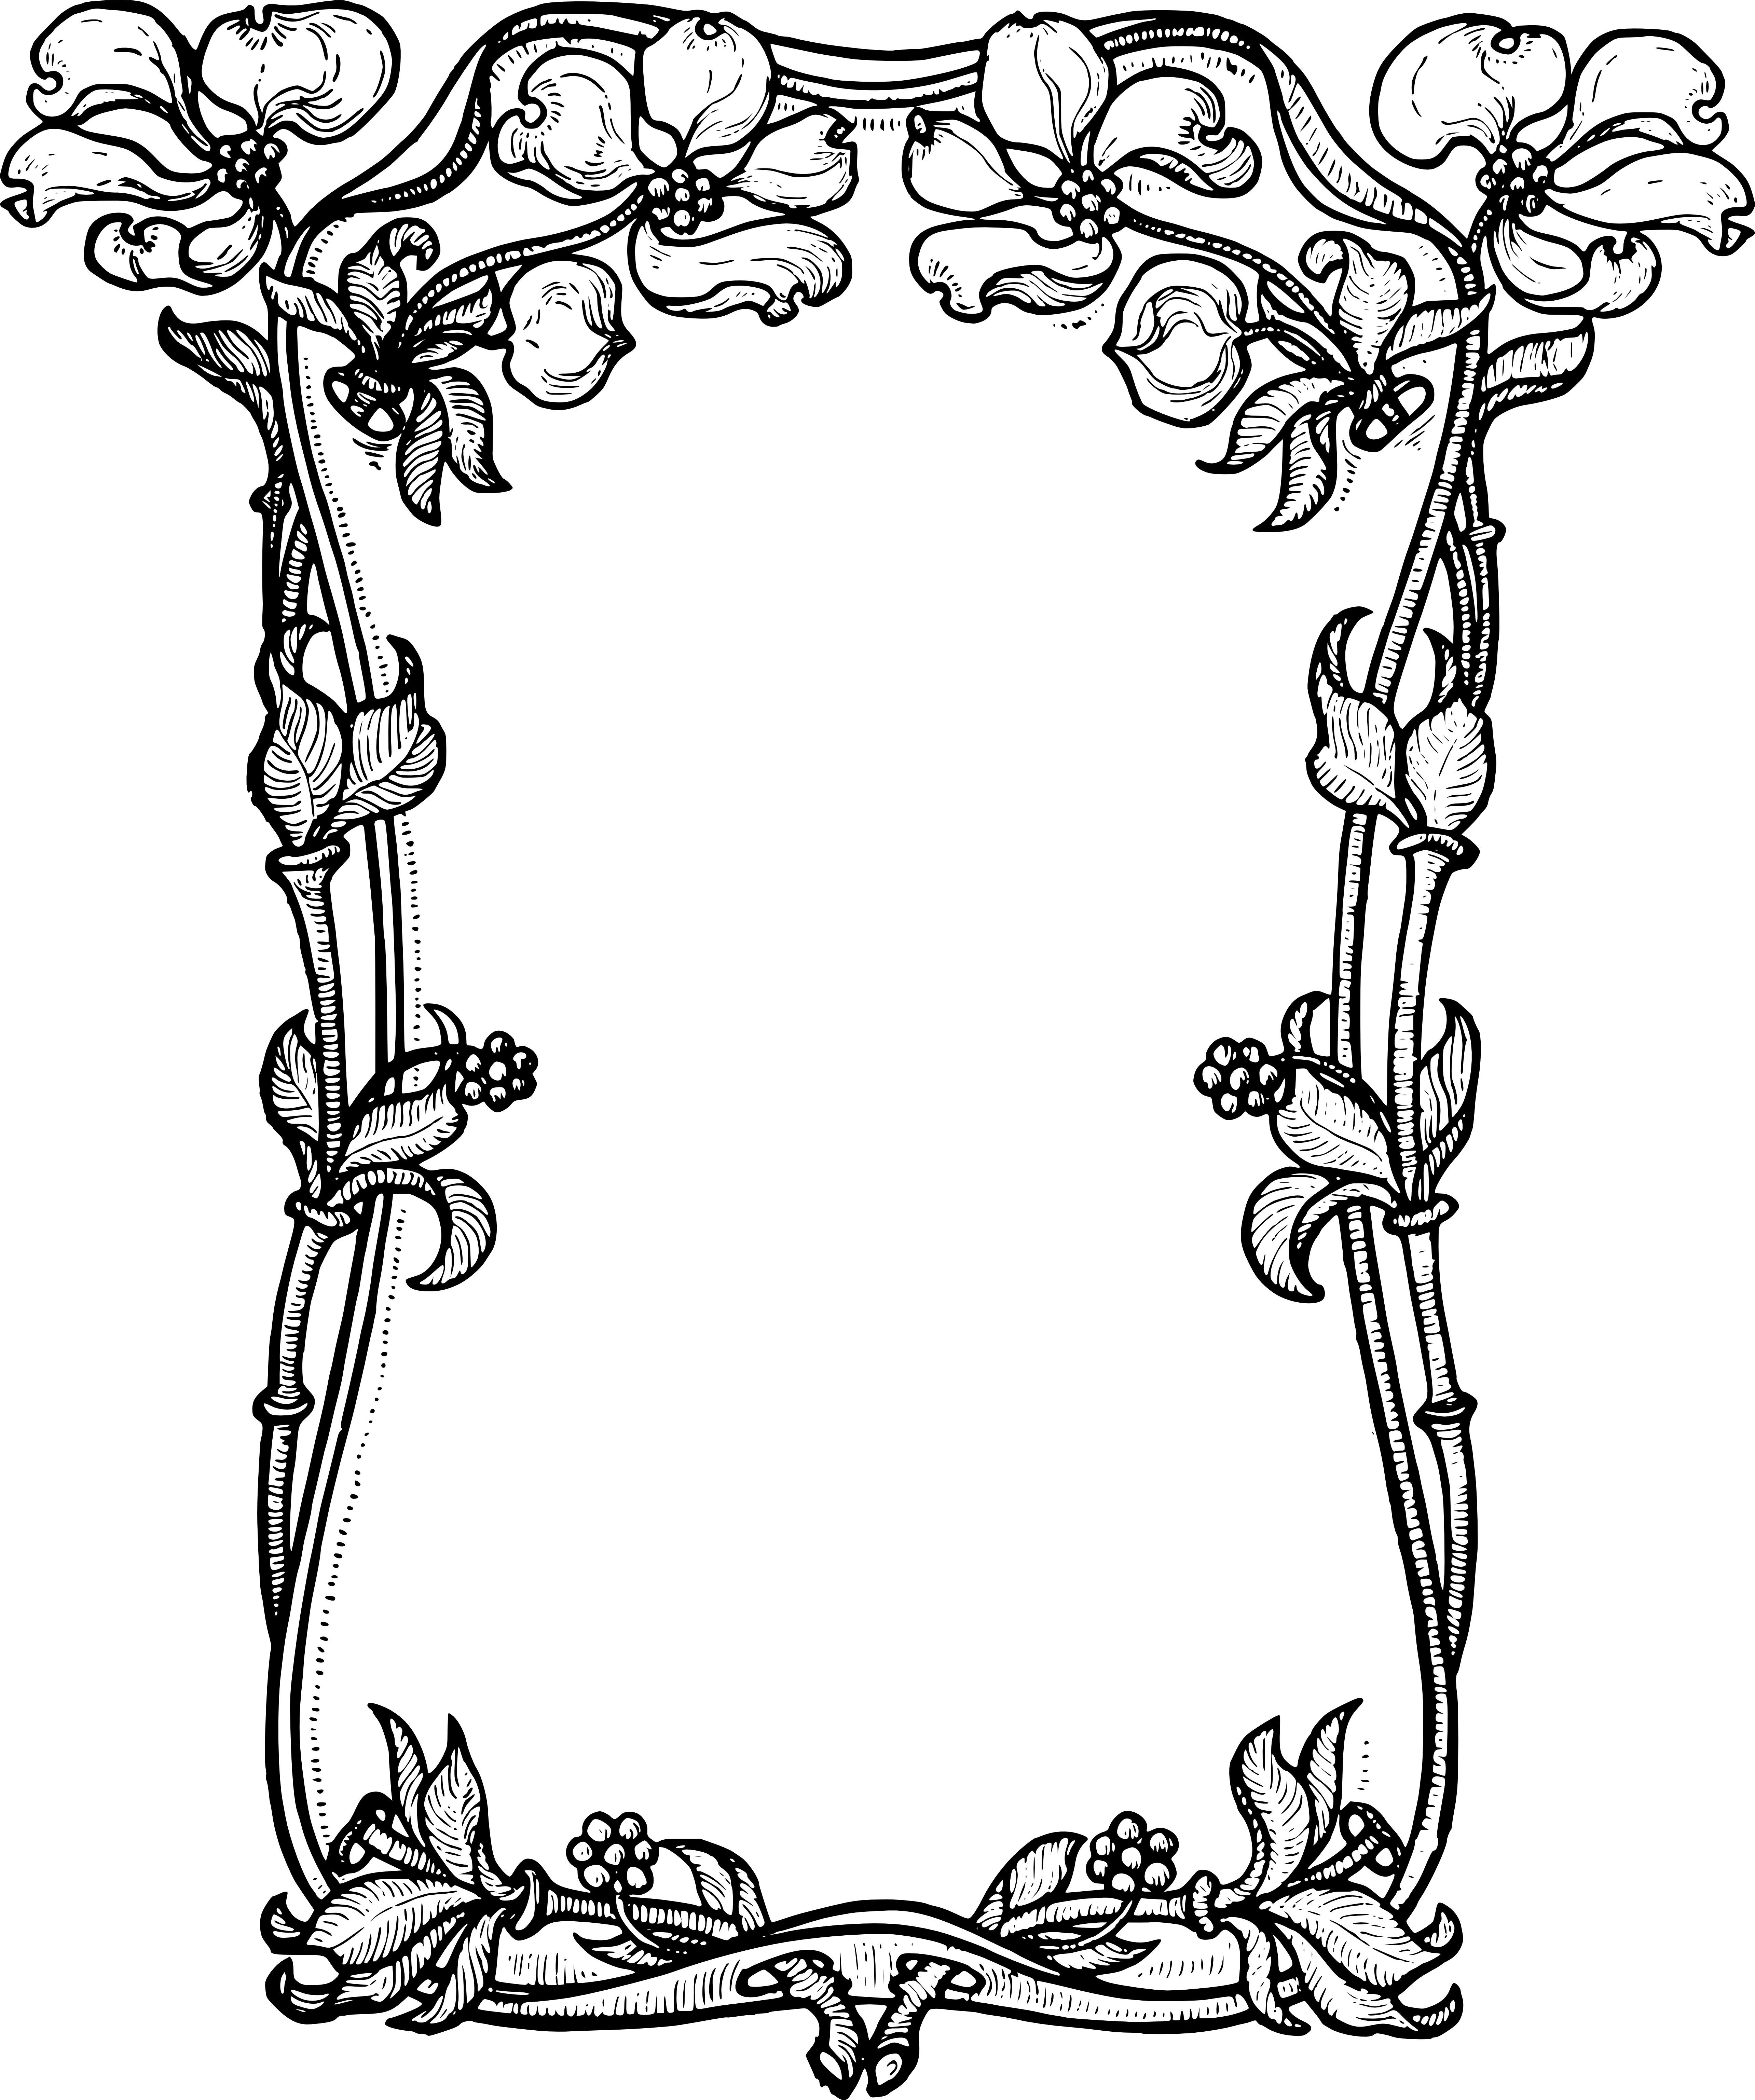 Flower Frame Line Drawing : Stock images dogwood flower frame clip art vector oh